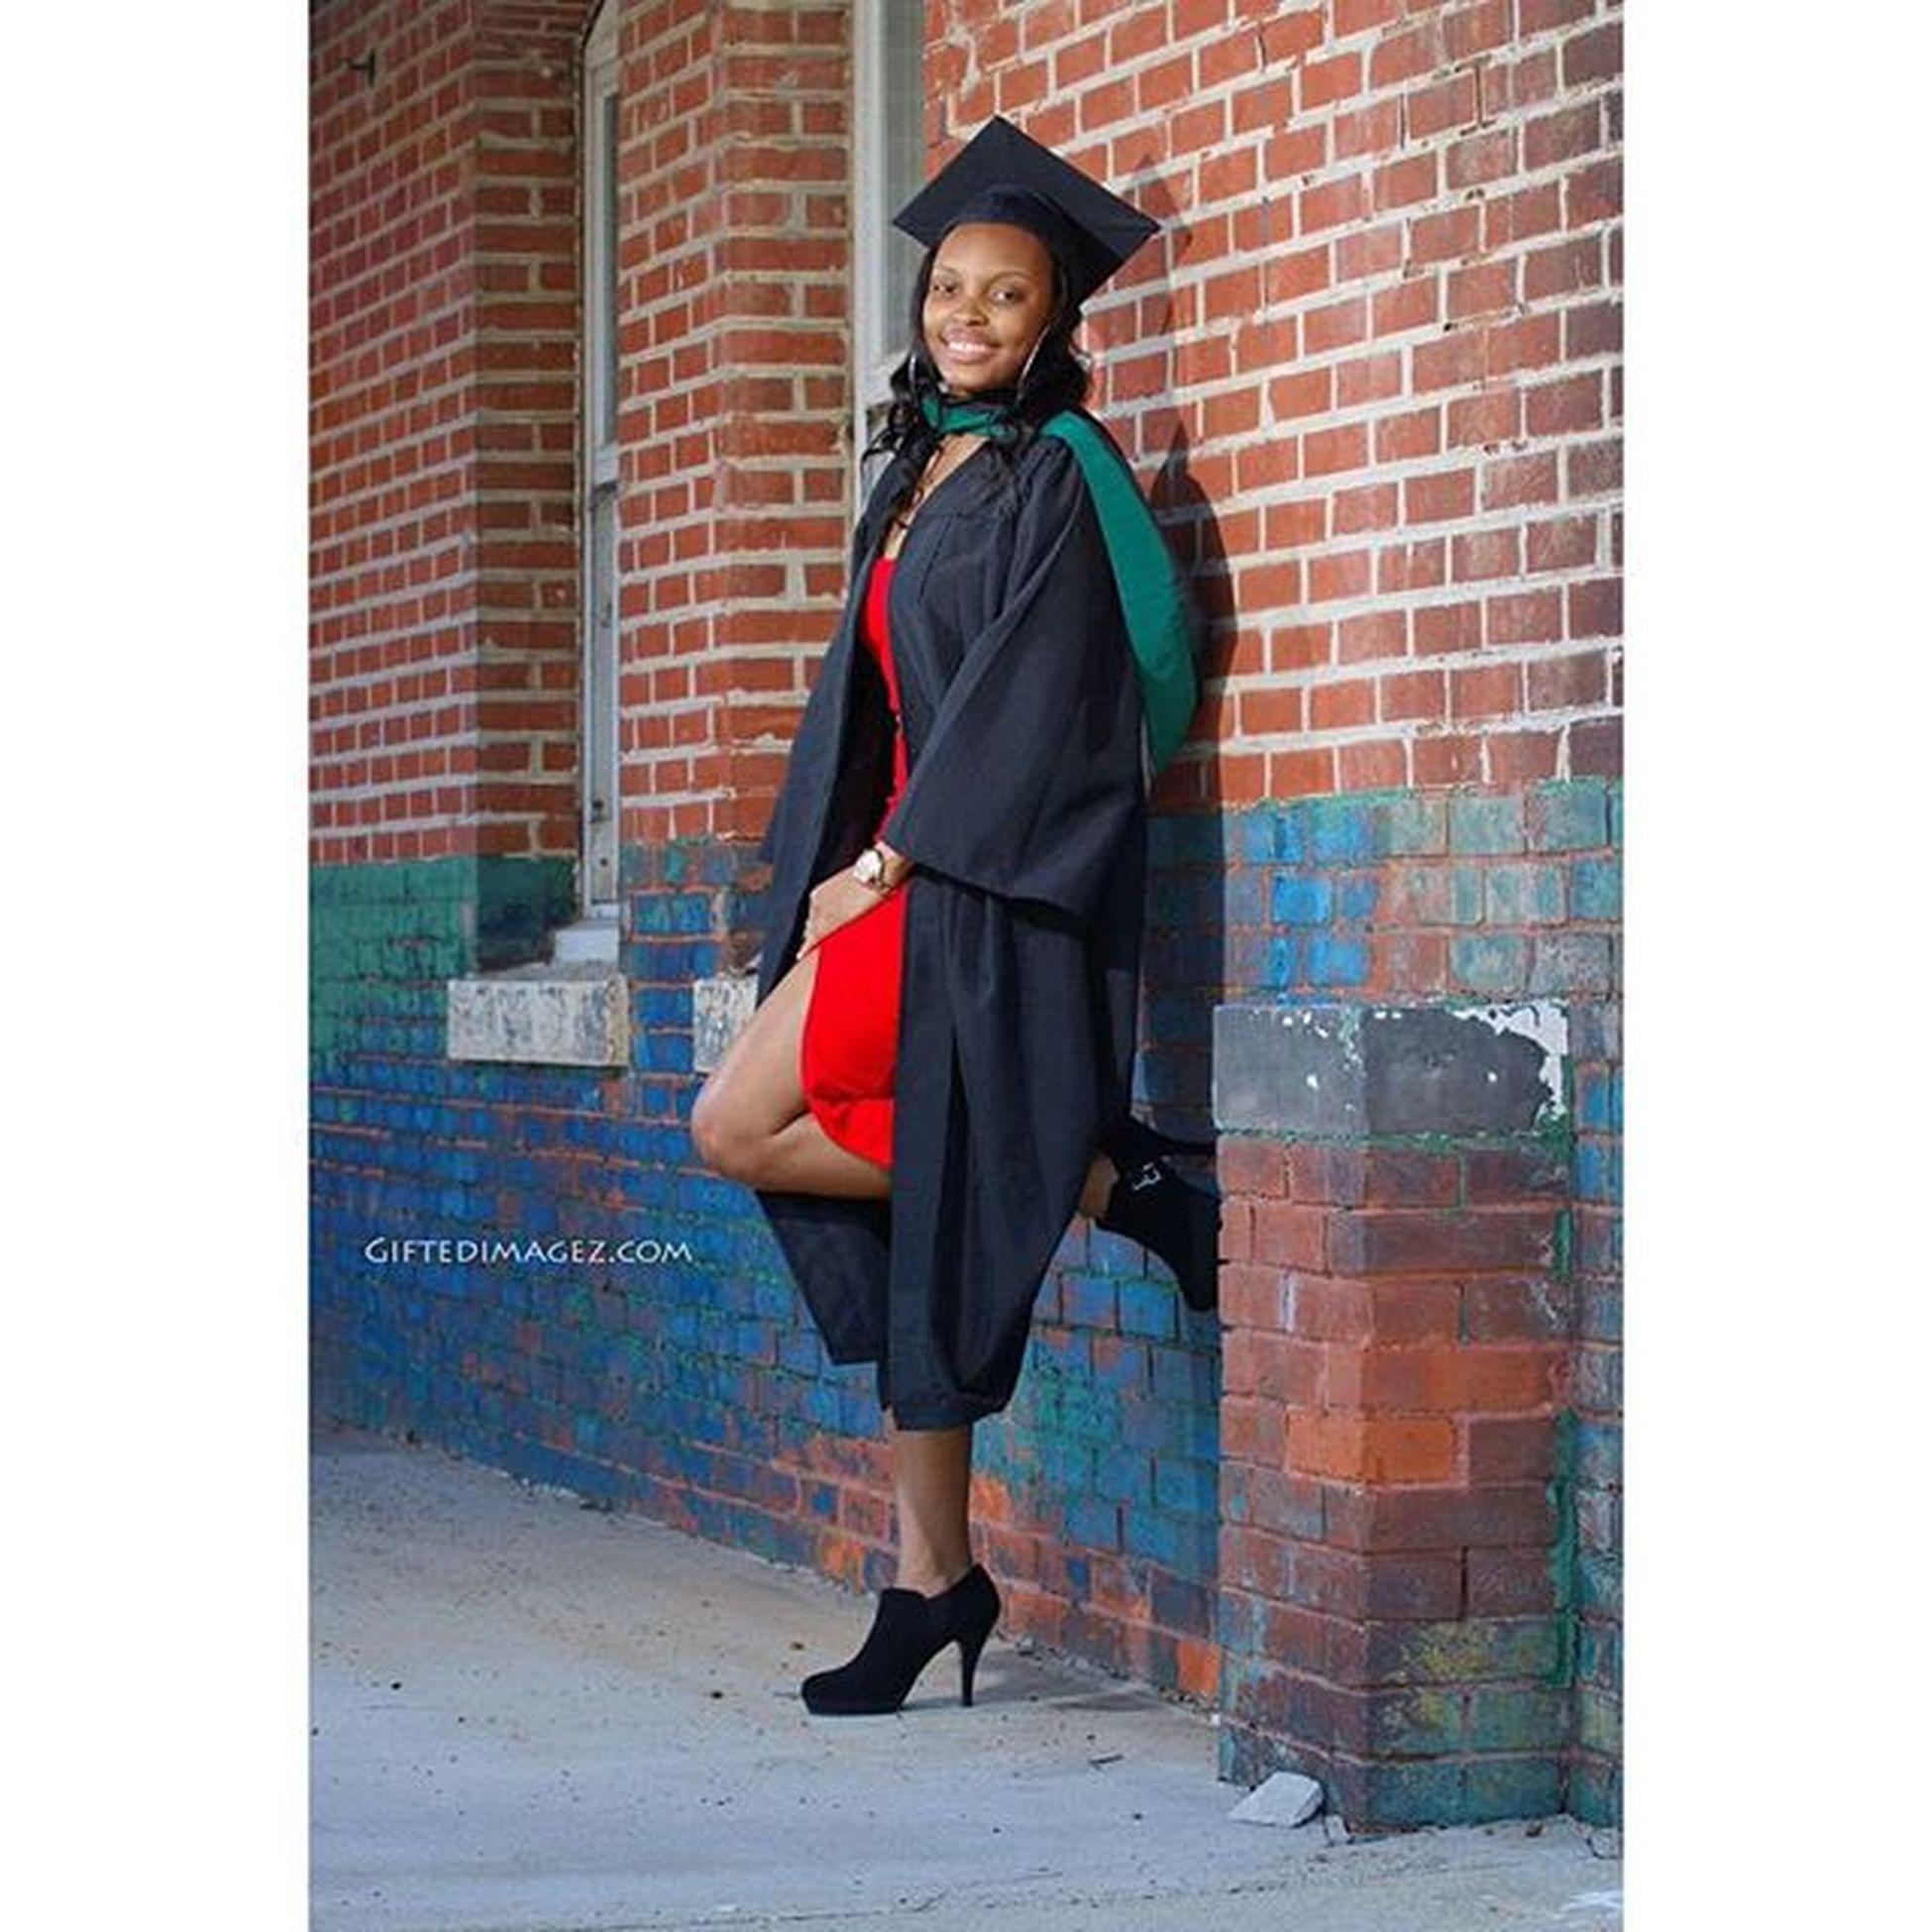 Graduation session!!! Giftedimagez Vaphotographer Vaphotography 757photographer 757photography Photographer Outdoorphotosession Portrait Portiture Virginiaphotography Hamptonroadsphotographer Newportnewsphotographer Graduationphotosession Odugrad15 Odugrad Graduate COLLEGEGRADUATE GraduationPhotoshoot CanonDSLR Canont6s Canoncamera Tamronlens Tamron Acdseepro ACDSee college canonrebal